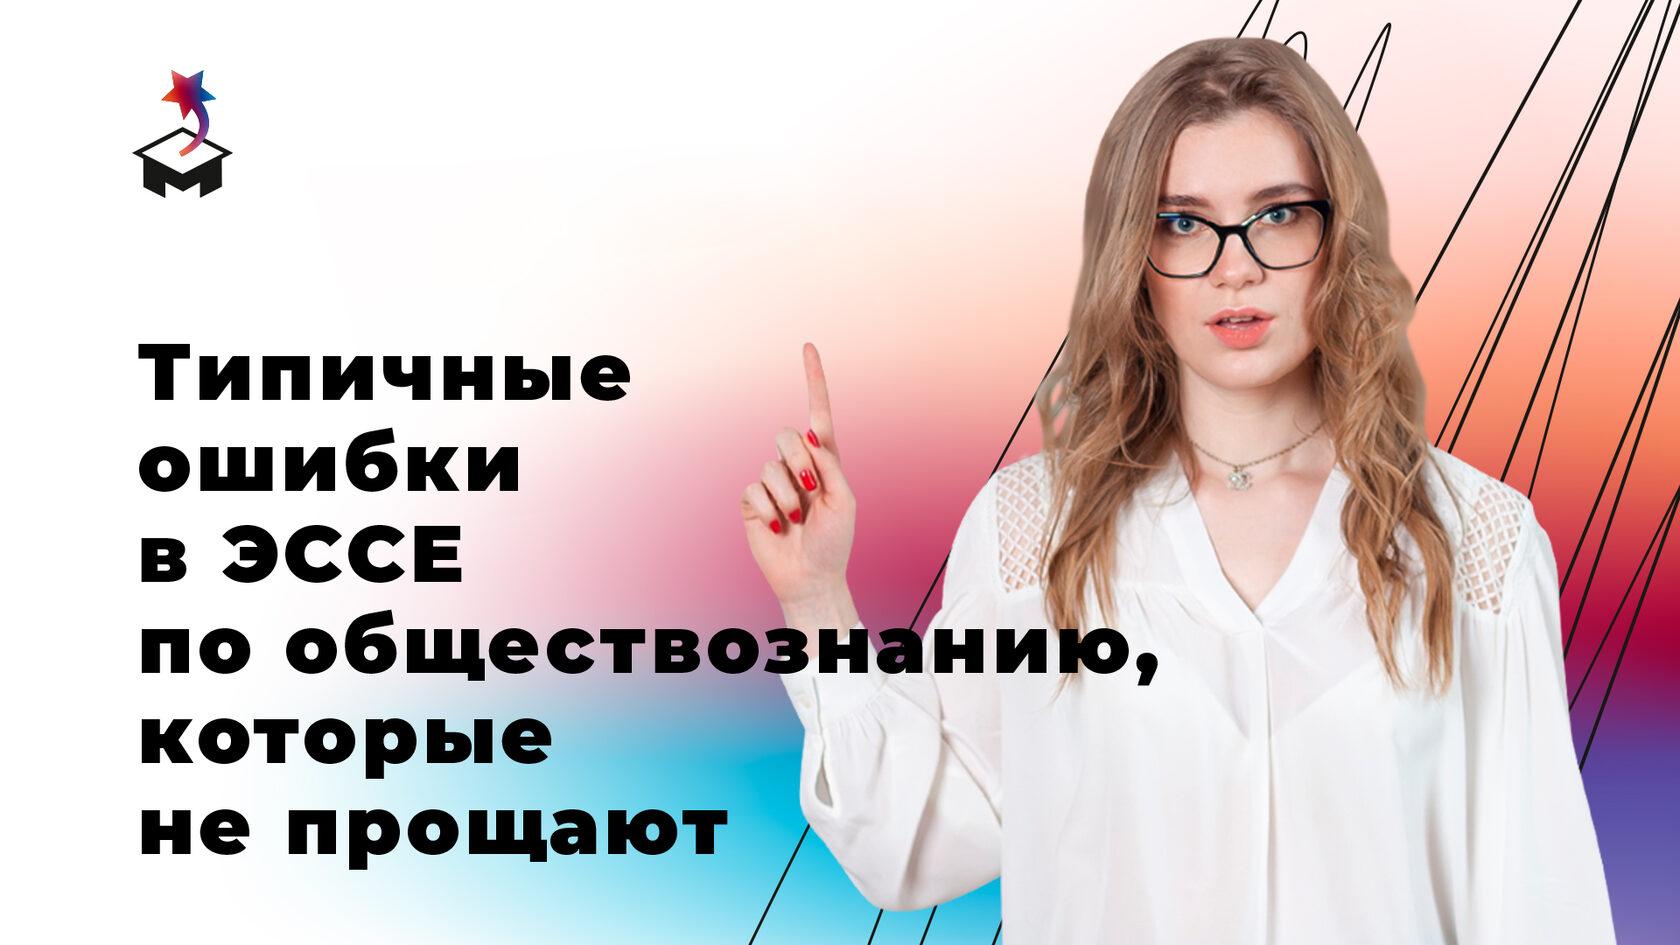 Анна Маркс с поднятым вверх указательным пальцем